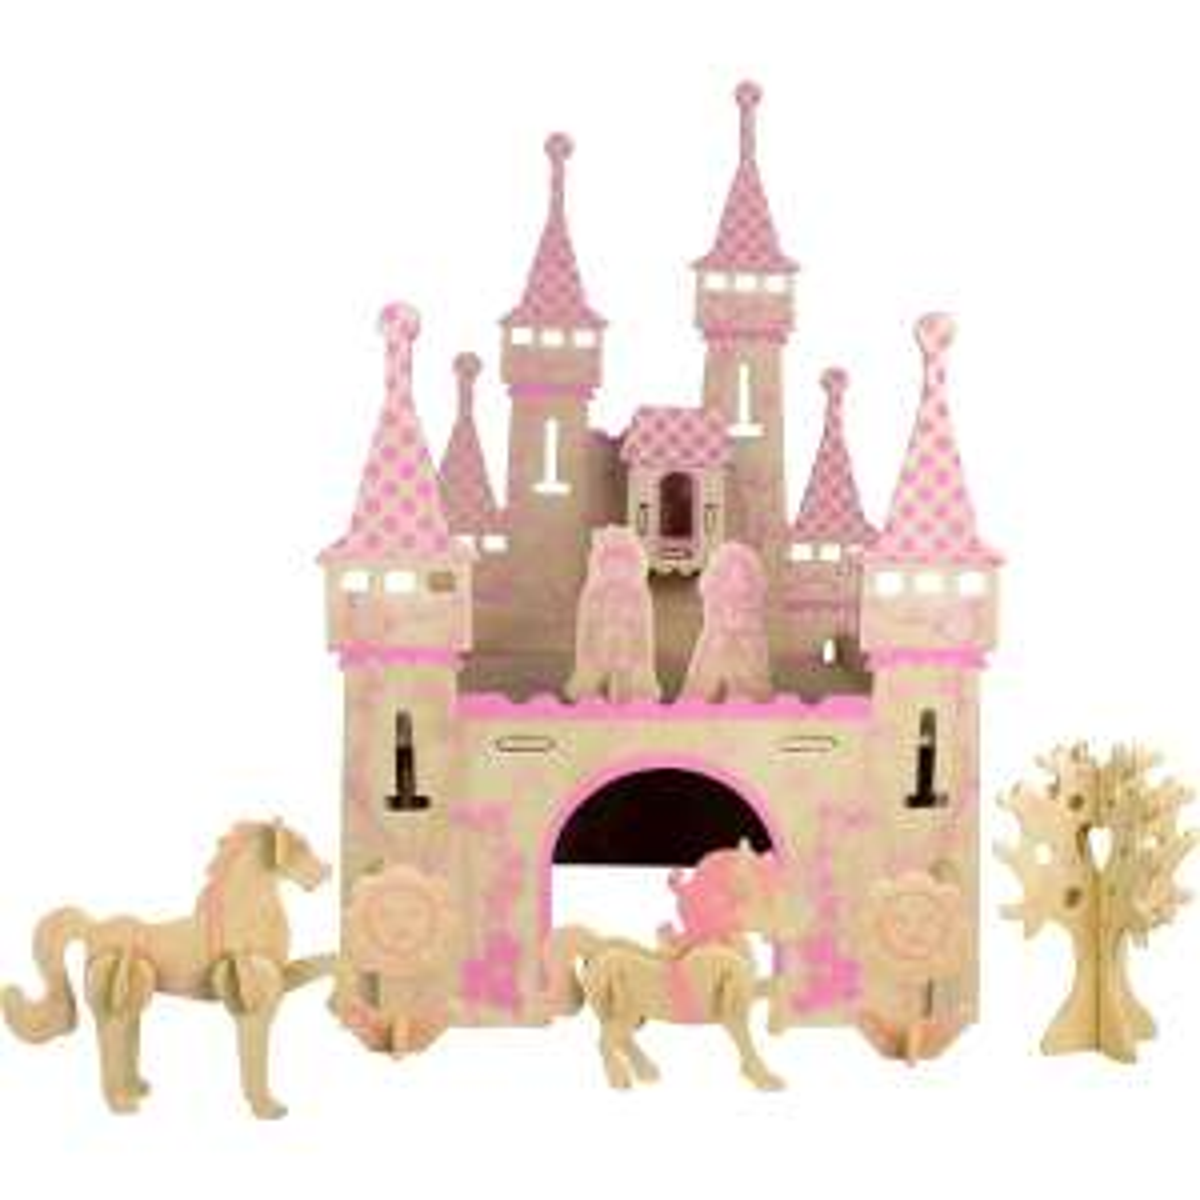 HobbyCraft 3D Wooden Castle Puzzle half price £3.25 Instore & Online